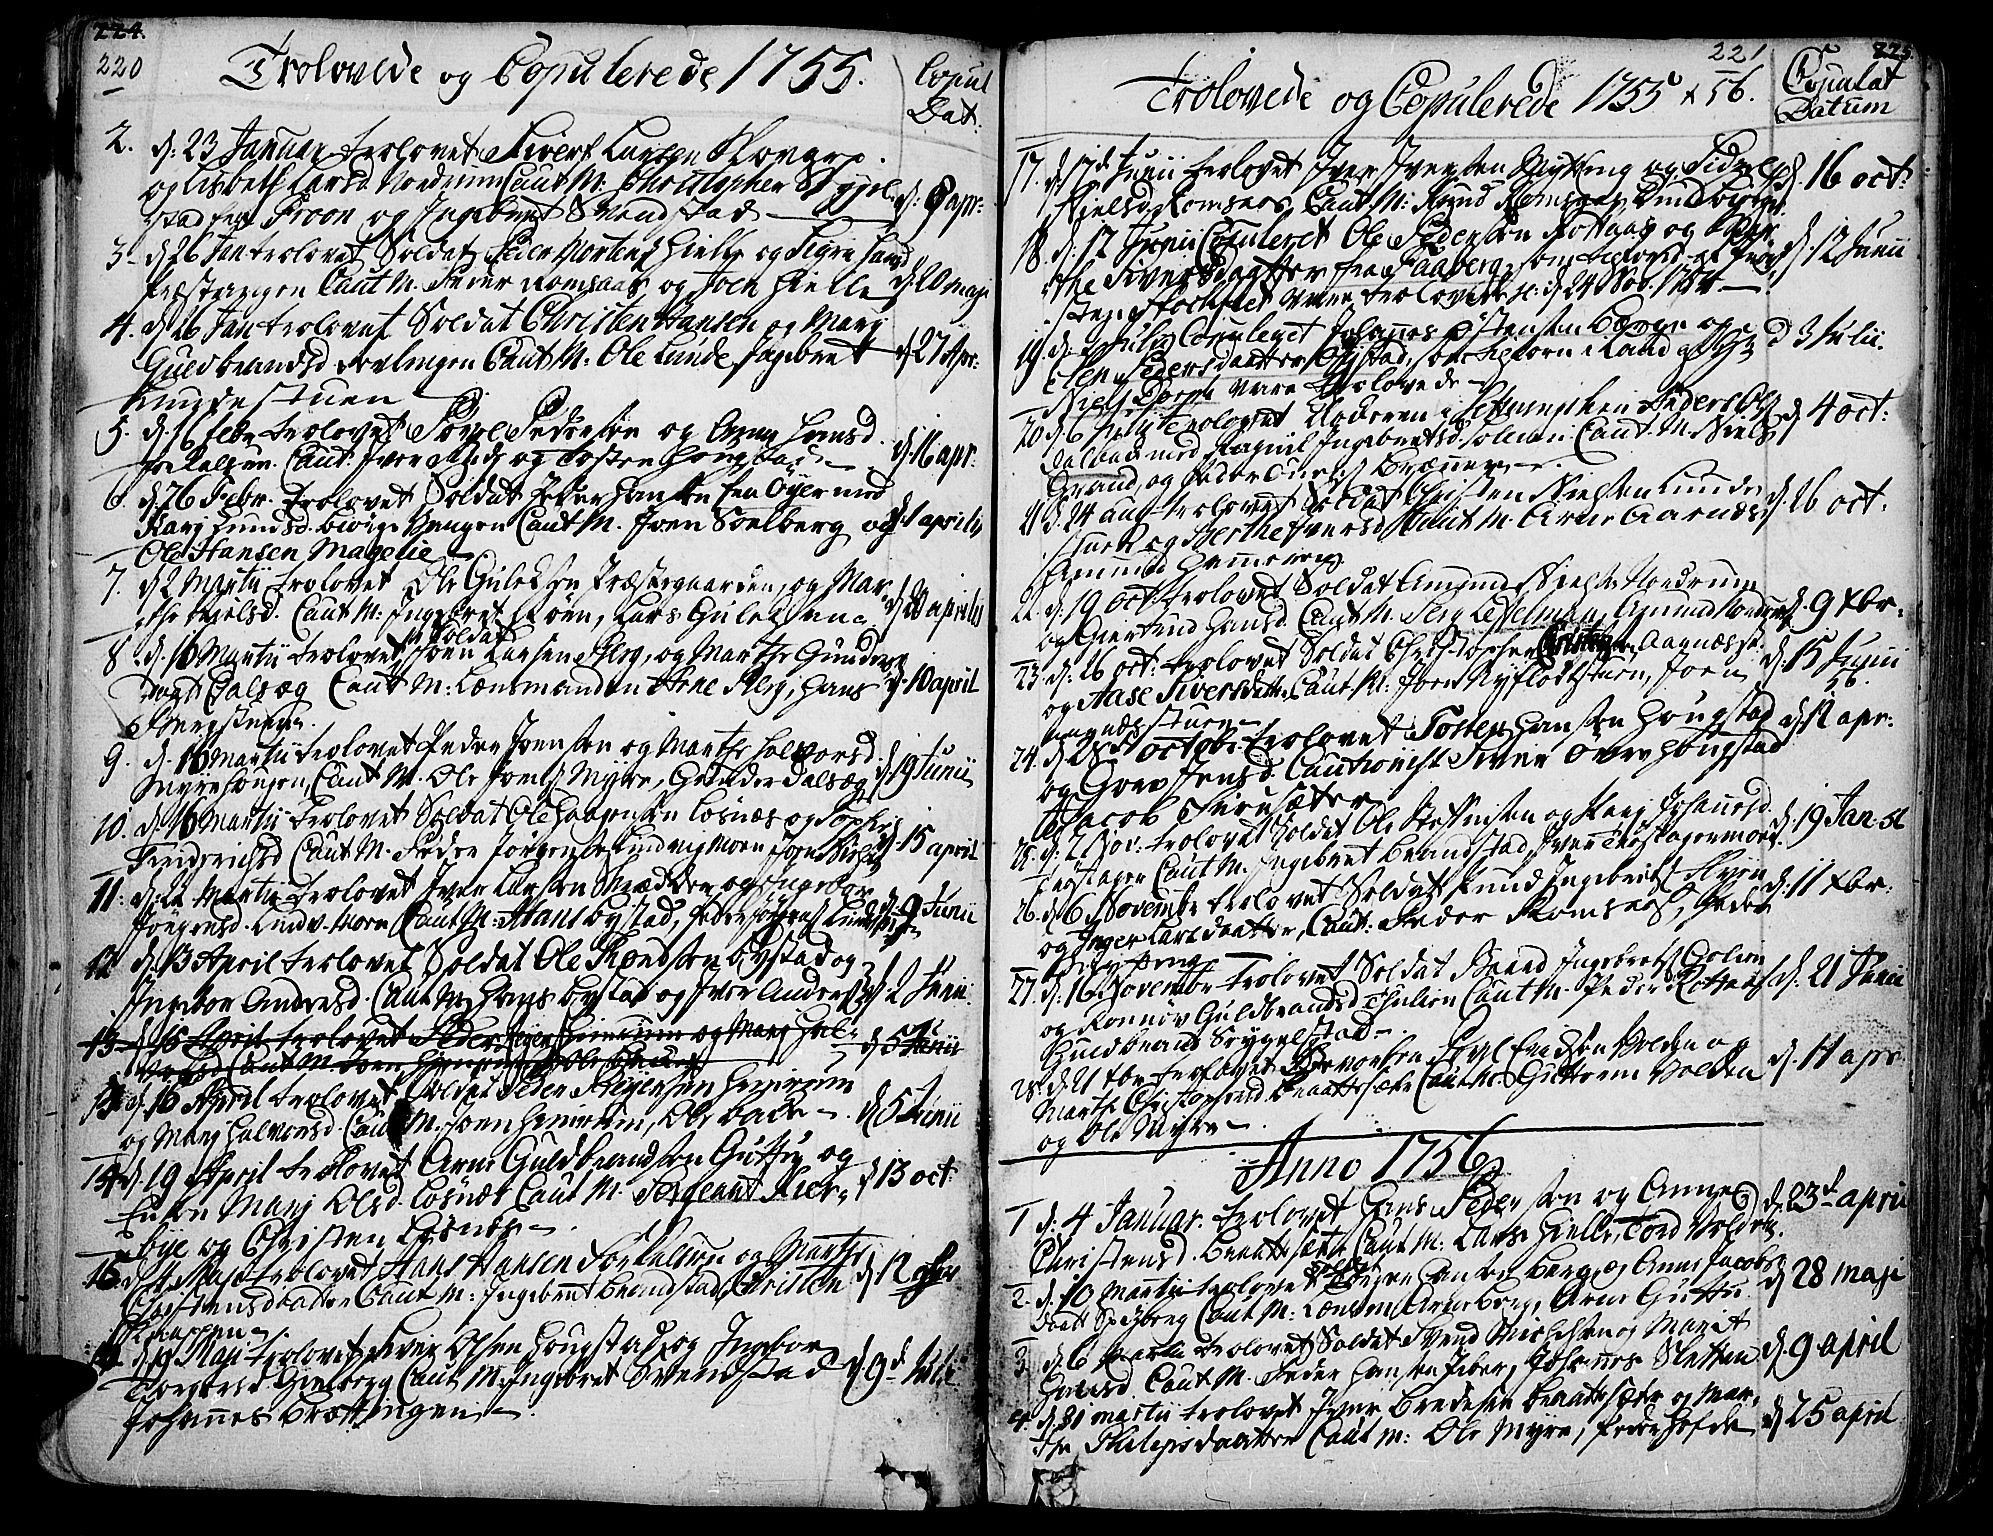 SAH, Ringebu prestekontor, Ministerialbok nr. 2, 1734-1780, s. 220-221